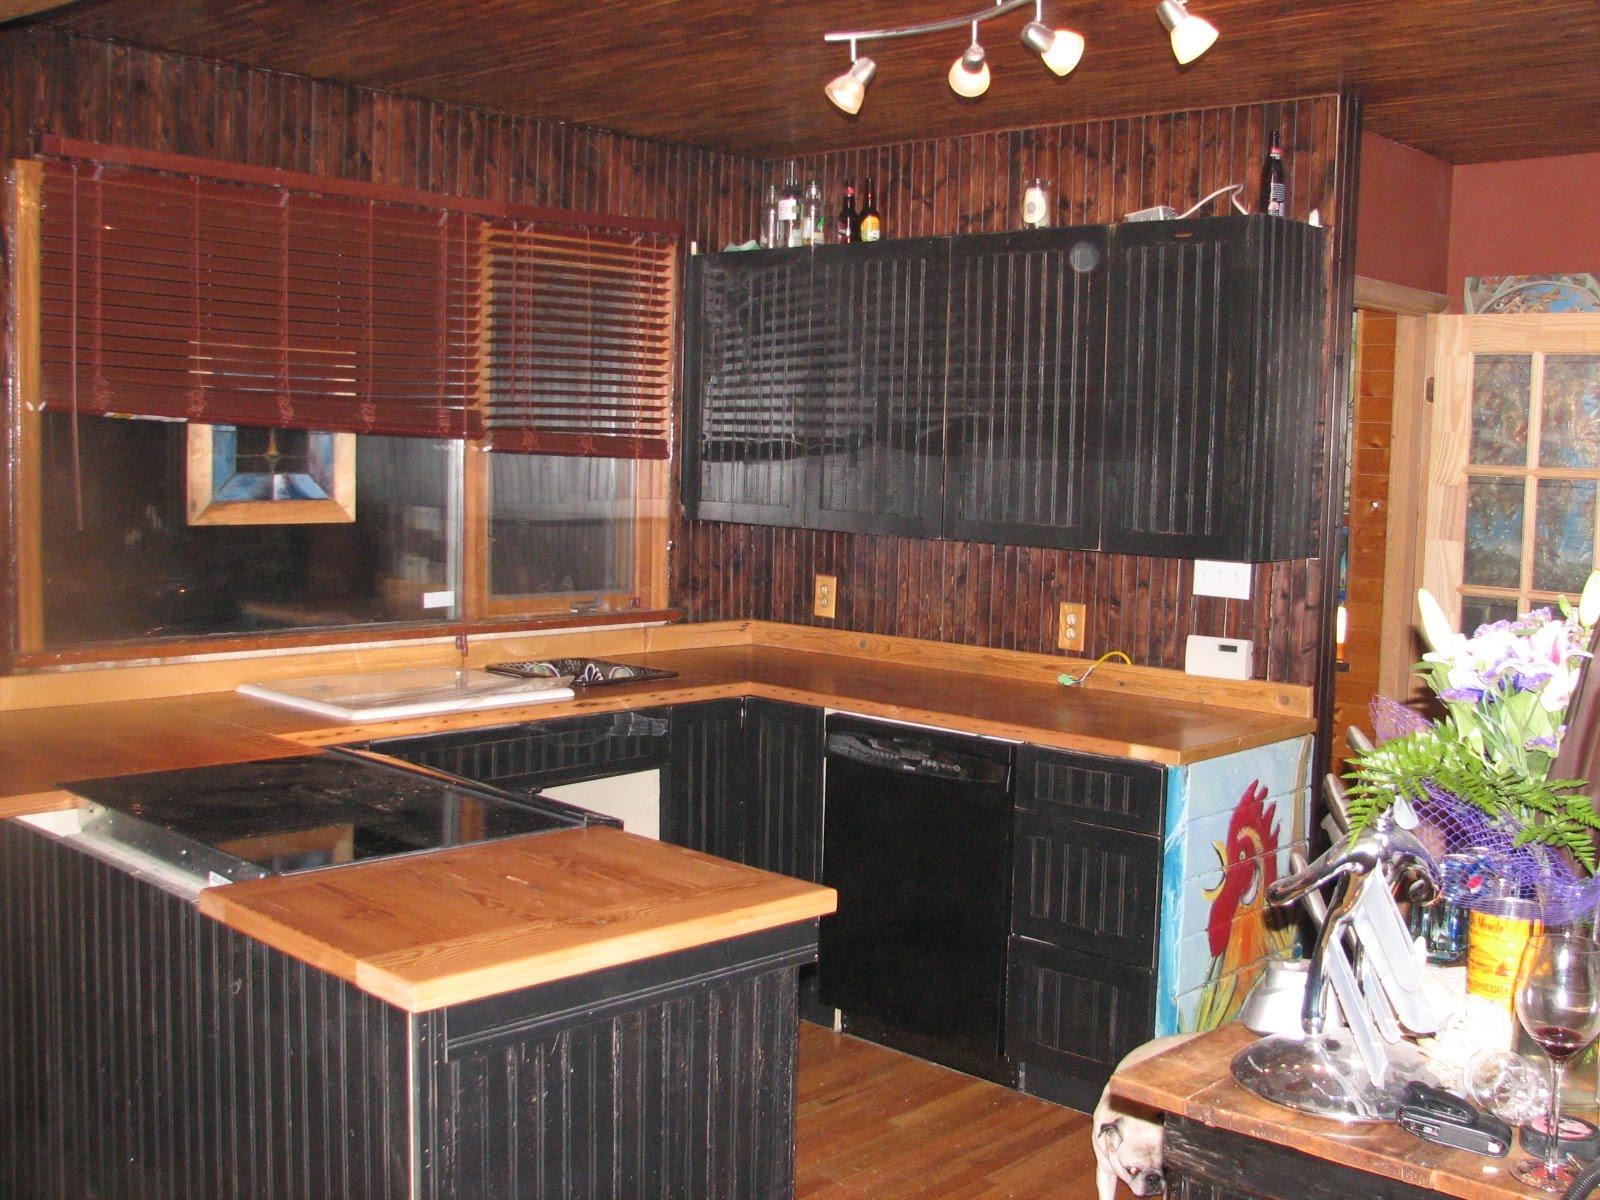 Kitchen cabinets barn wood - Barnwood Countertops And Cabinet Doors